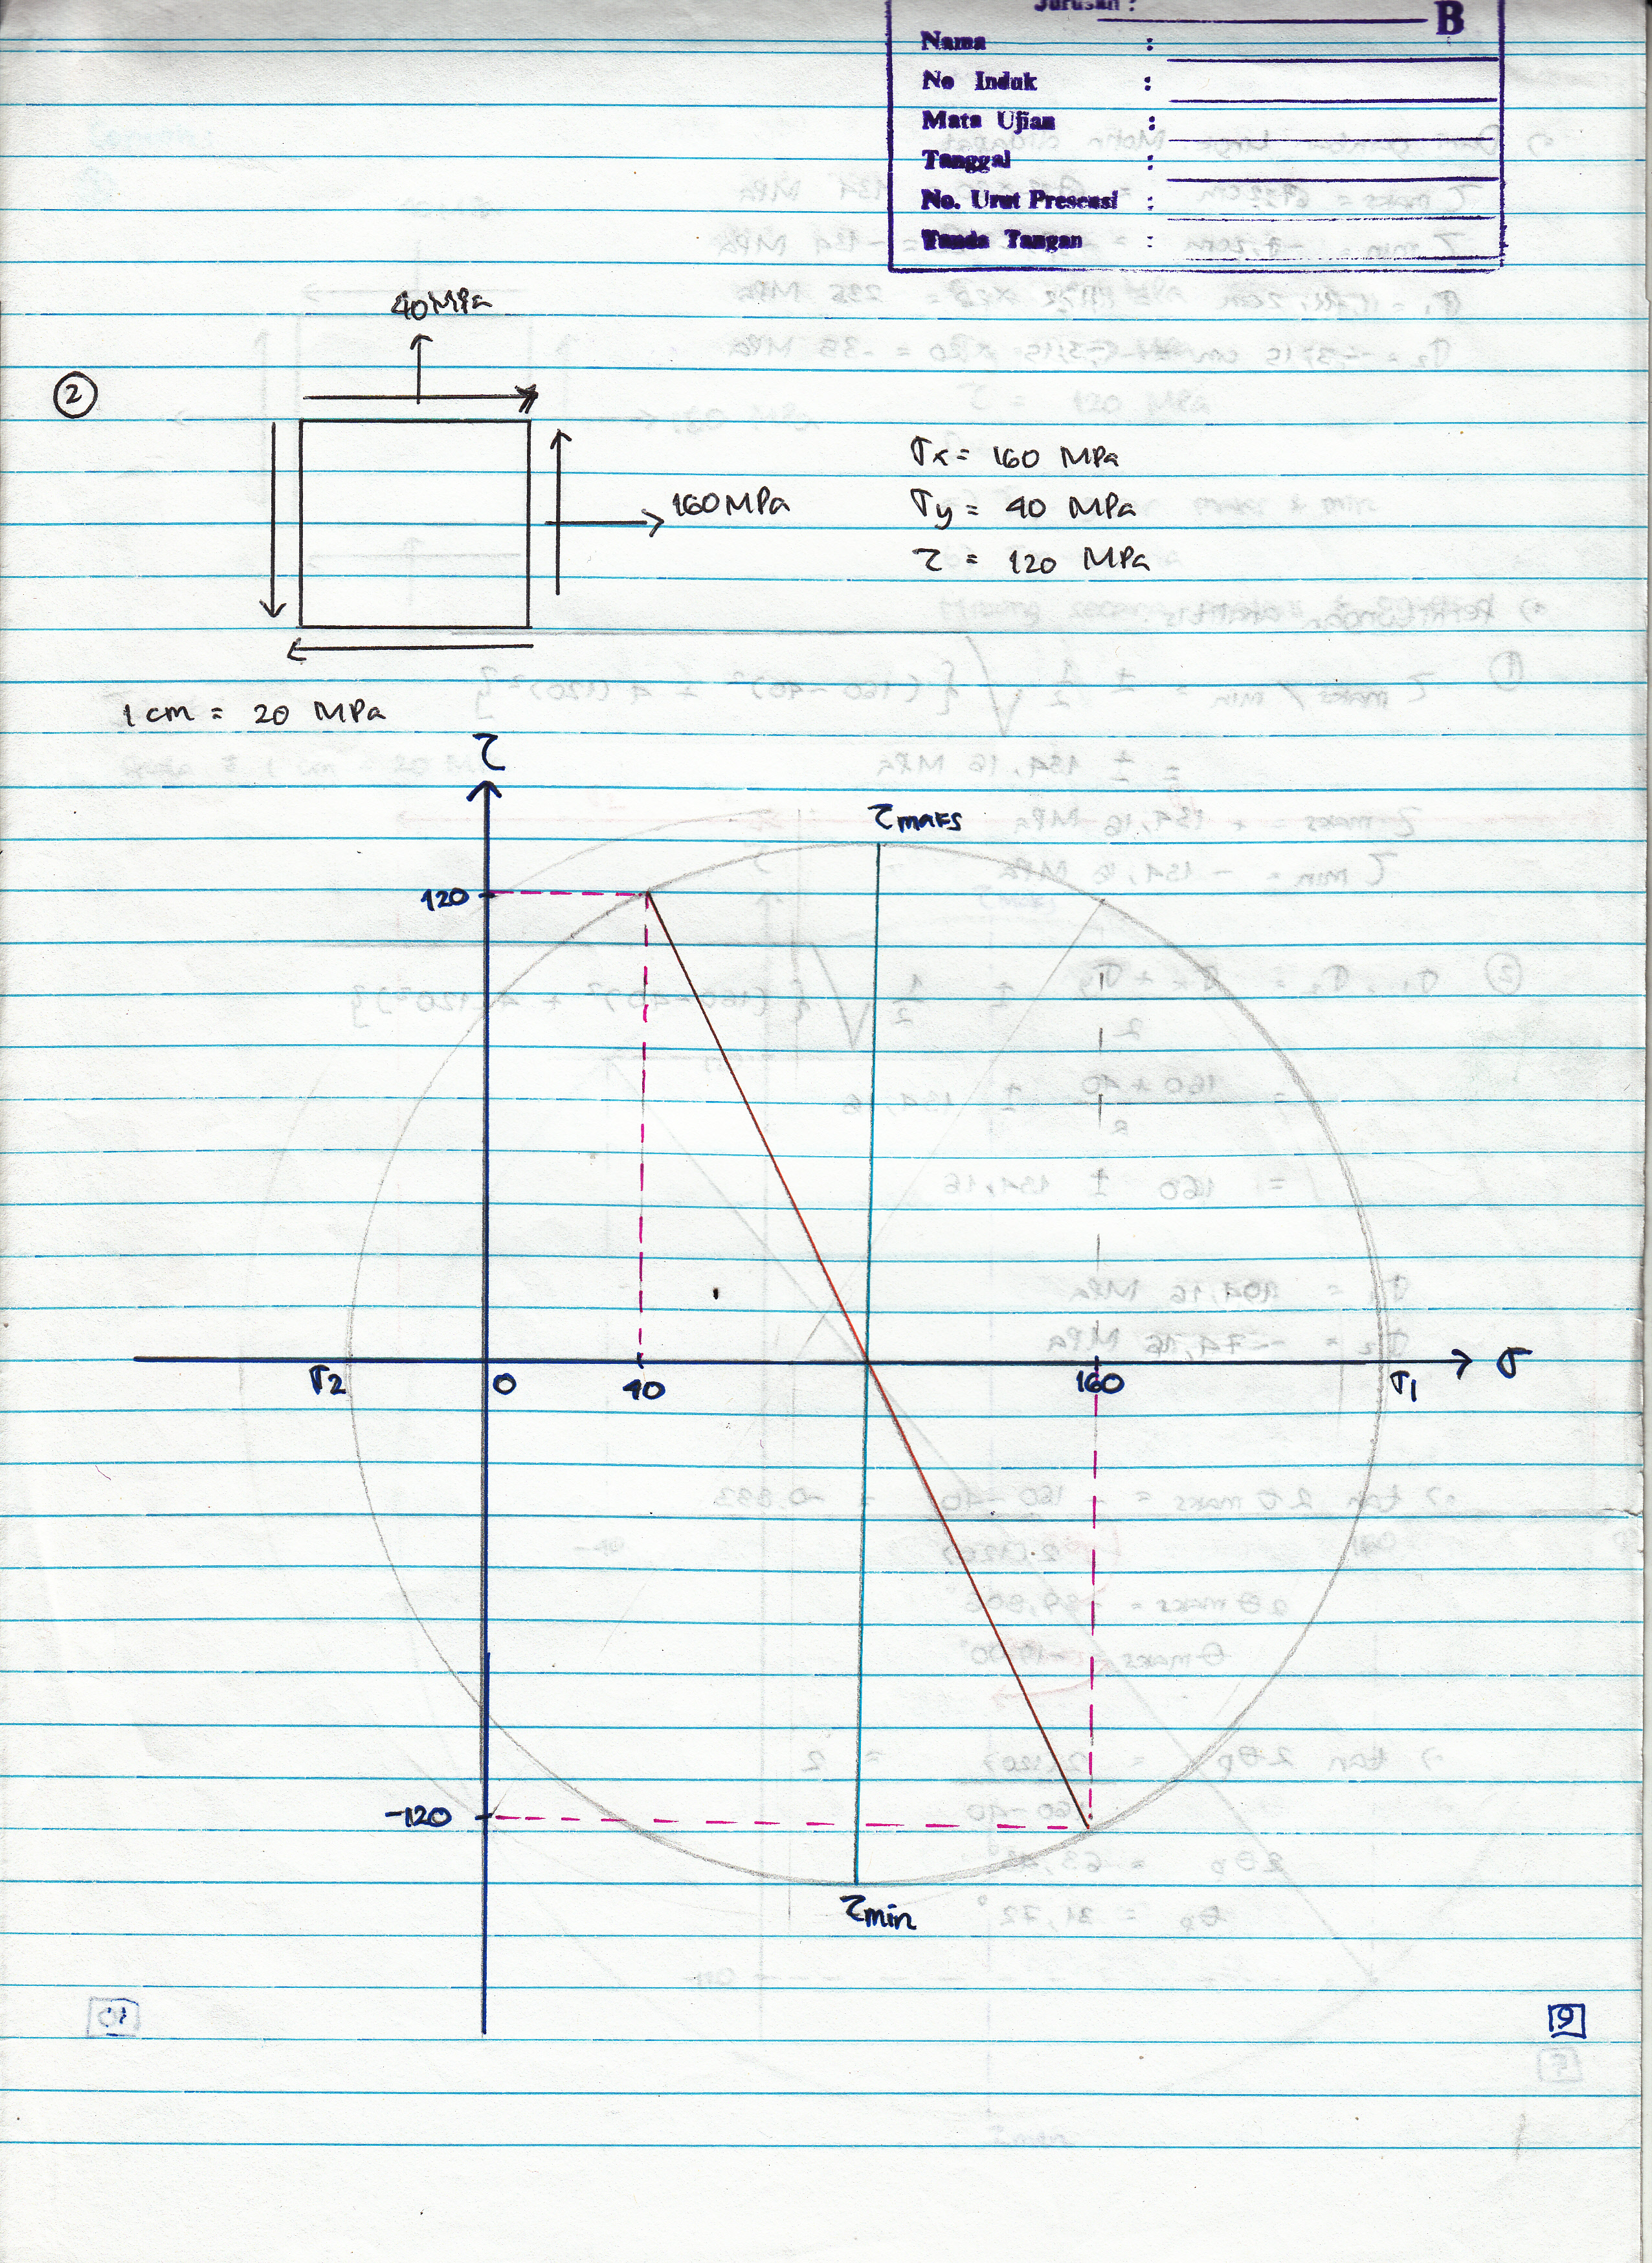 Contoh soal lingkaran mohr materi kuliah maya blog mohr 2 3 4 ccuart Images